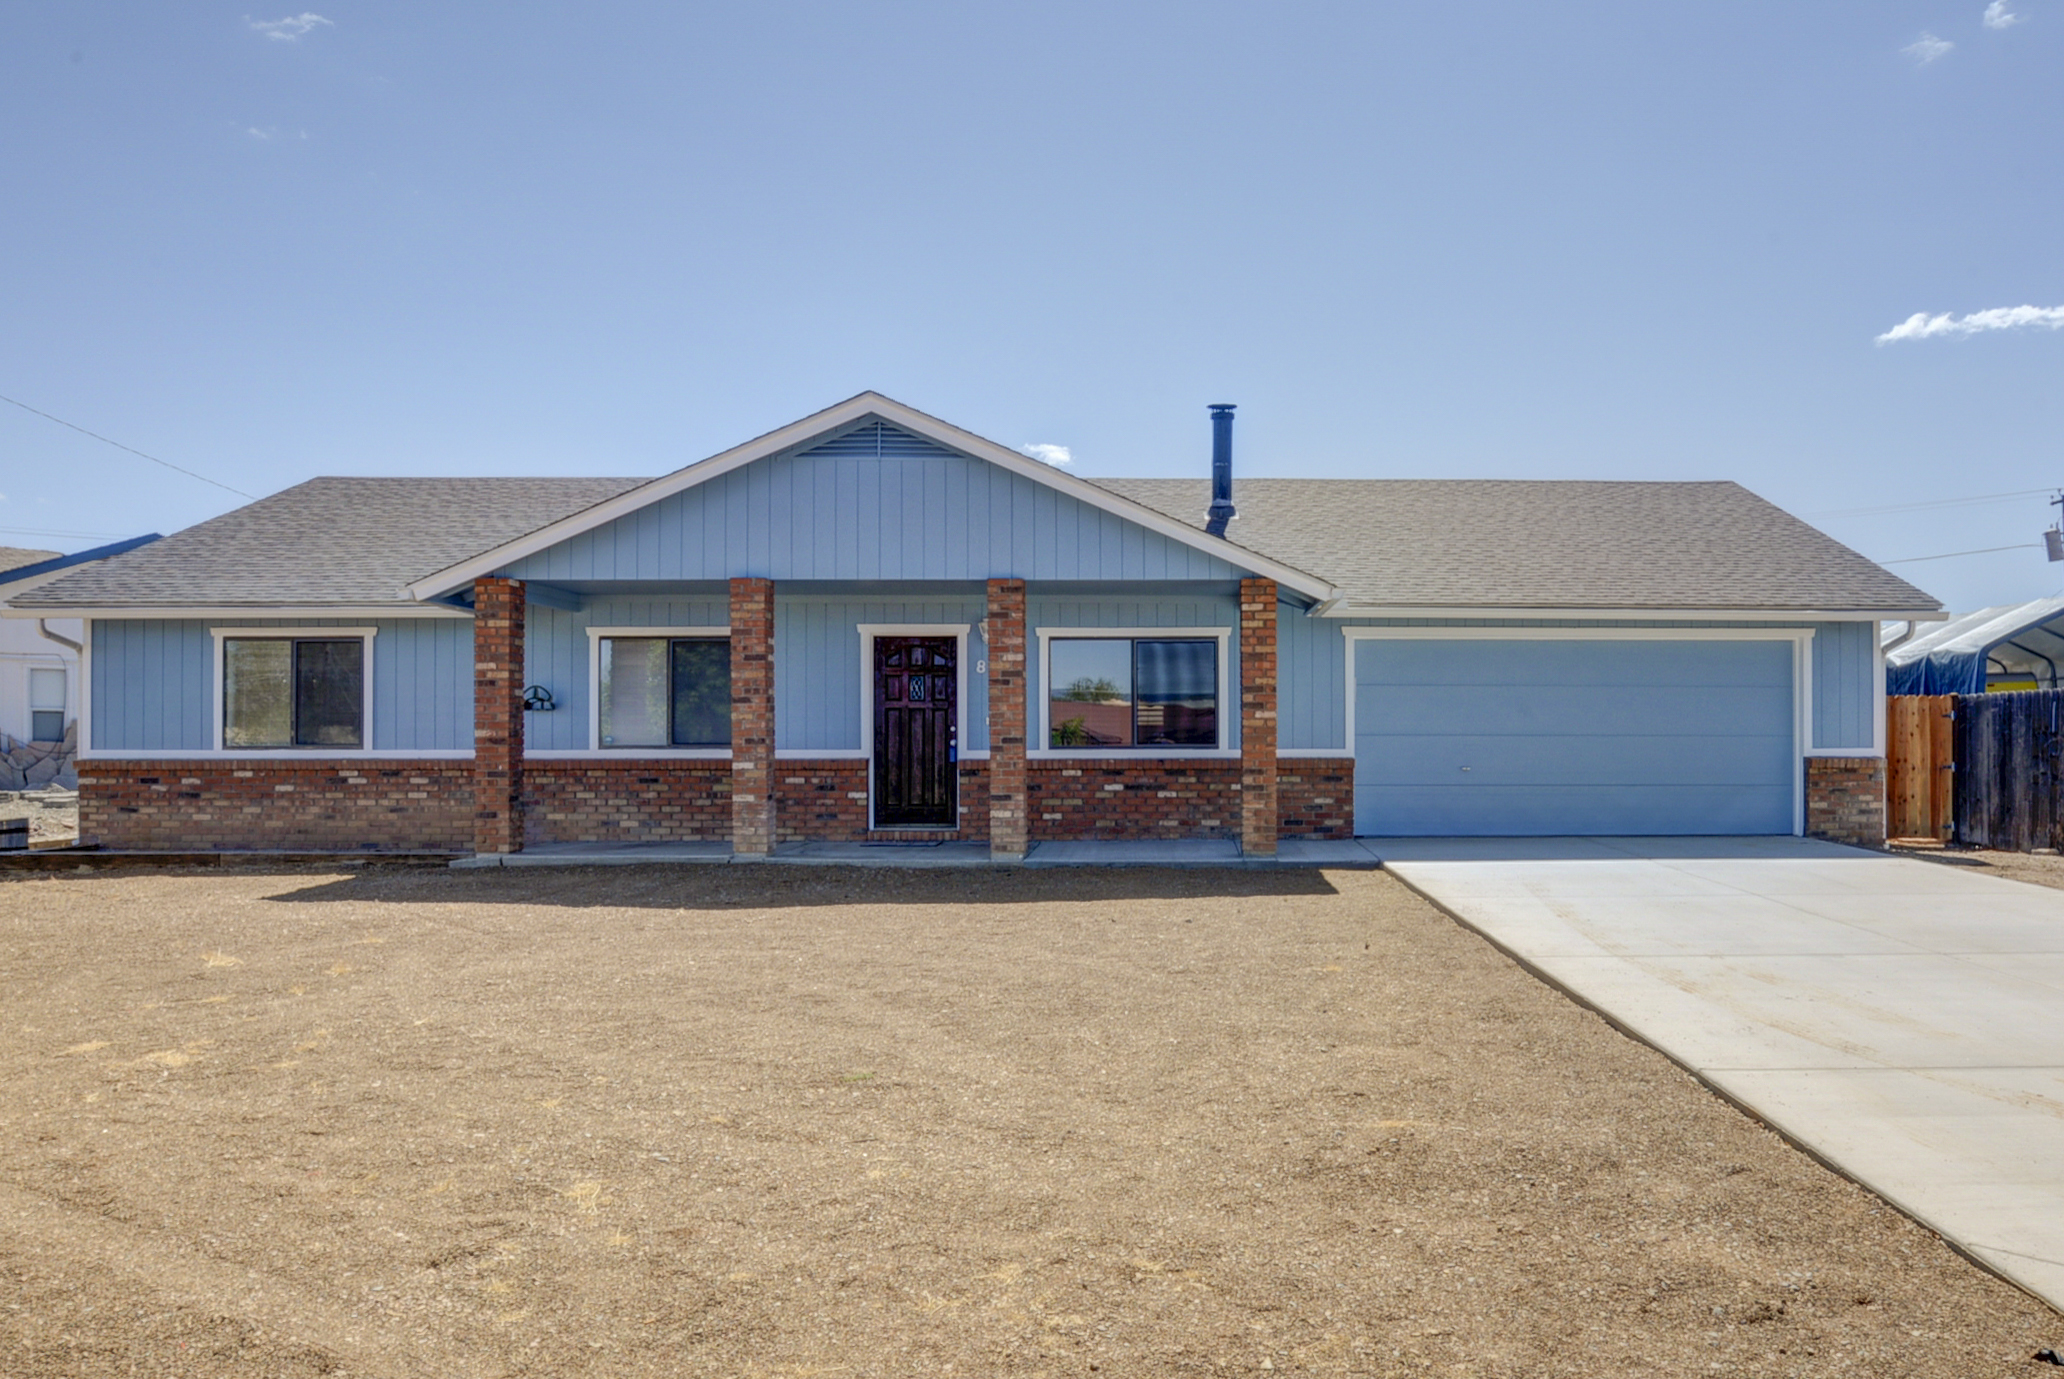 8201 E Barbara Road, Prescott, AZ 86314 – PENDING